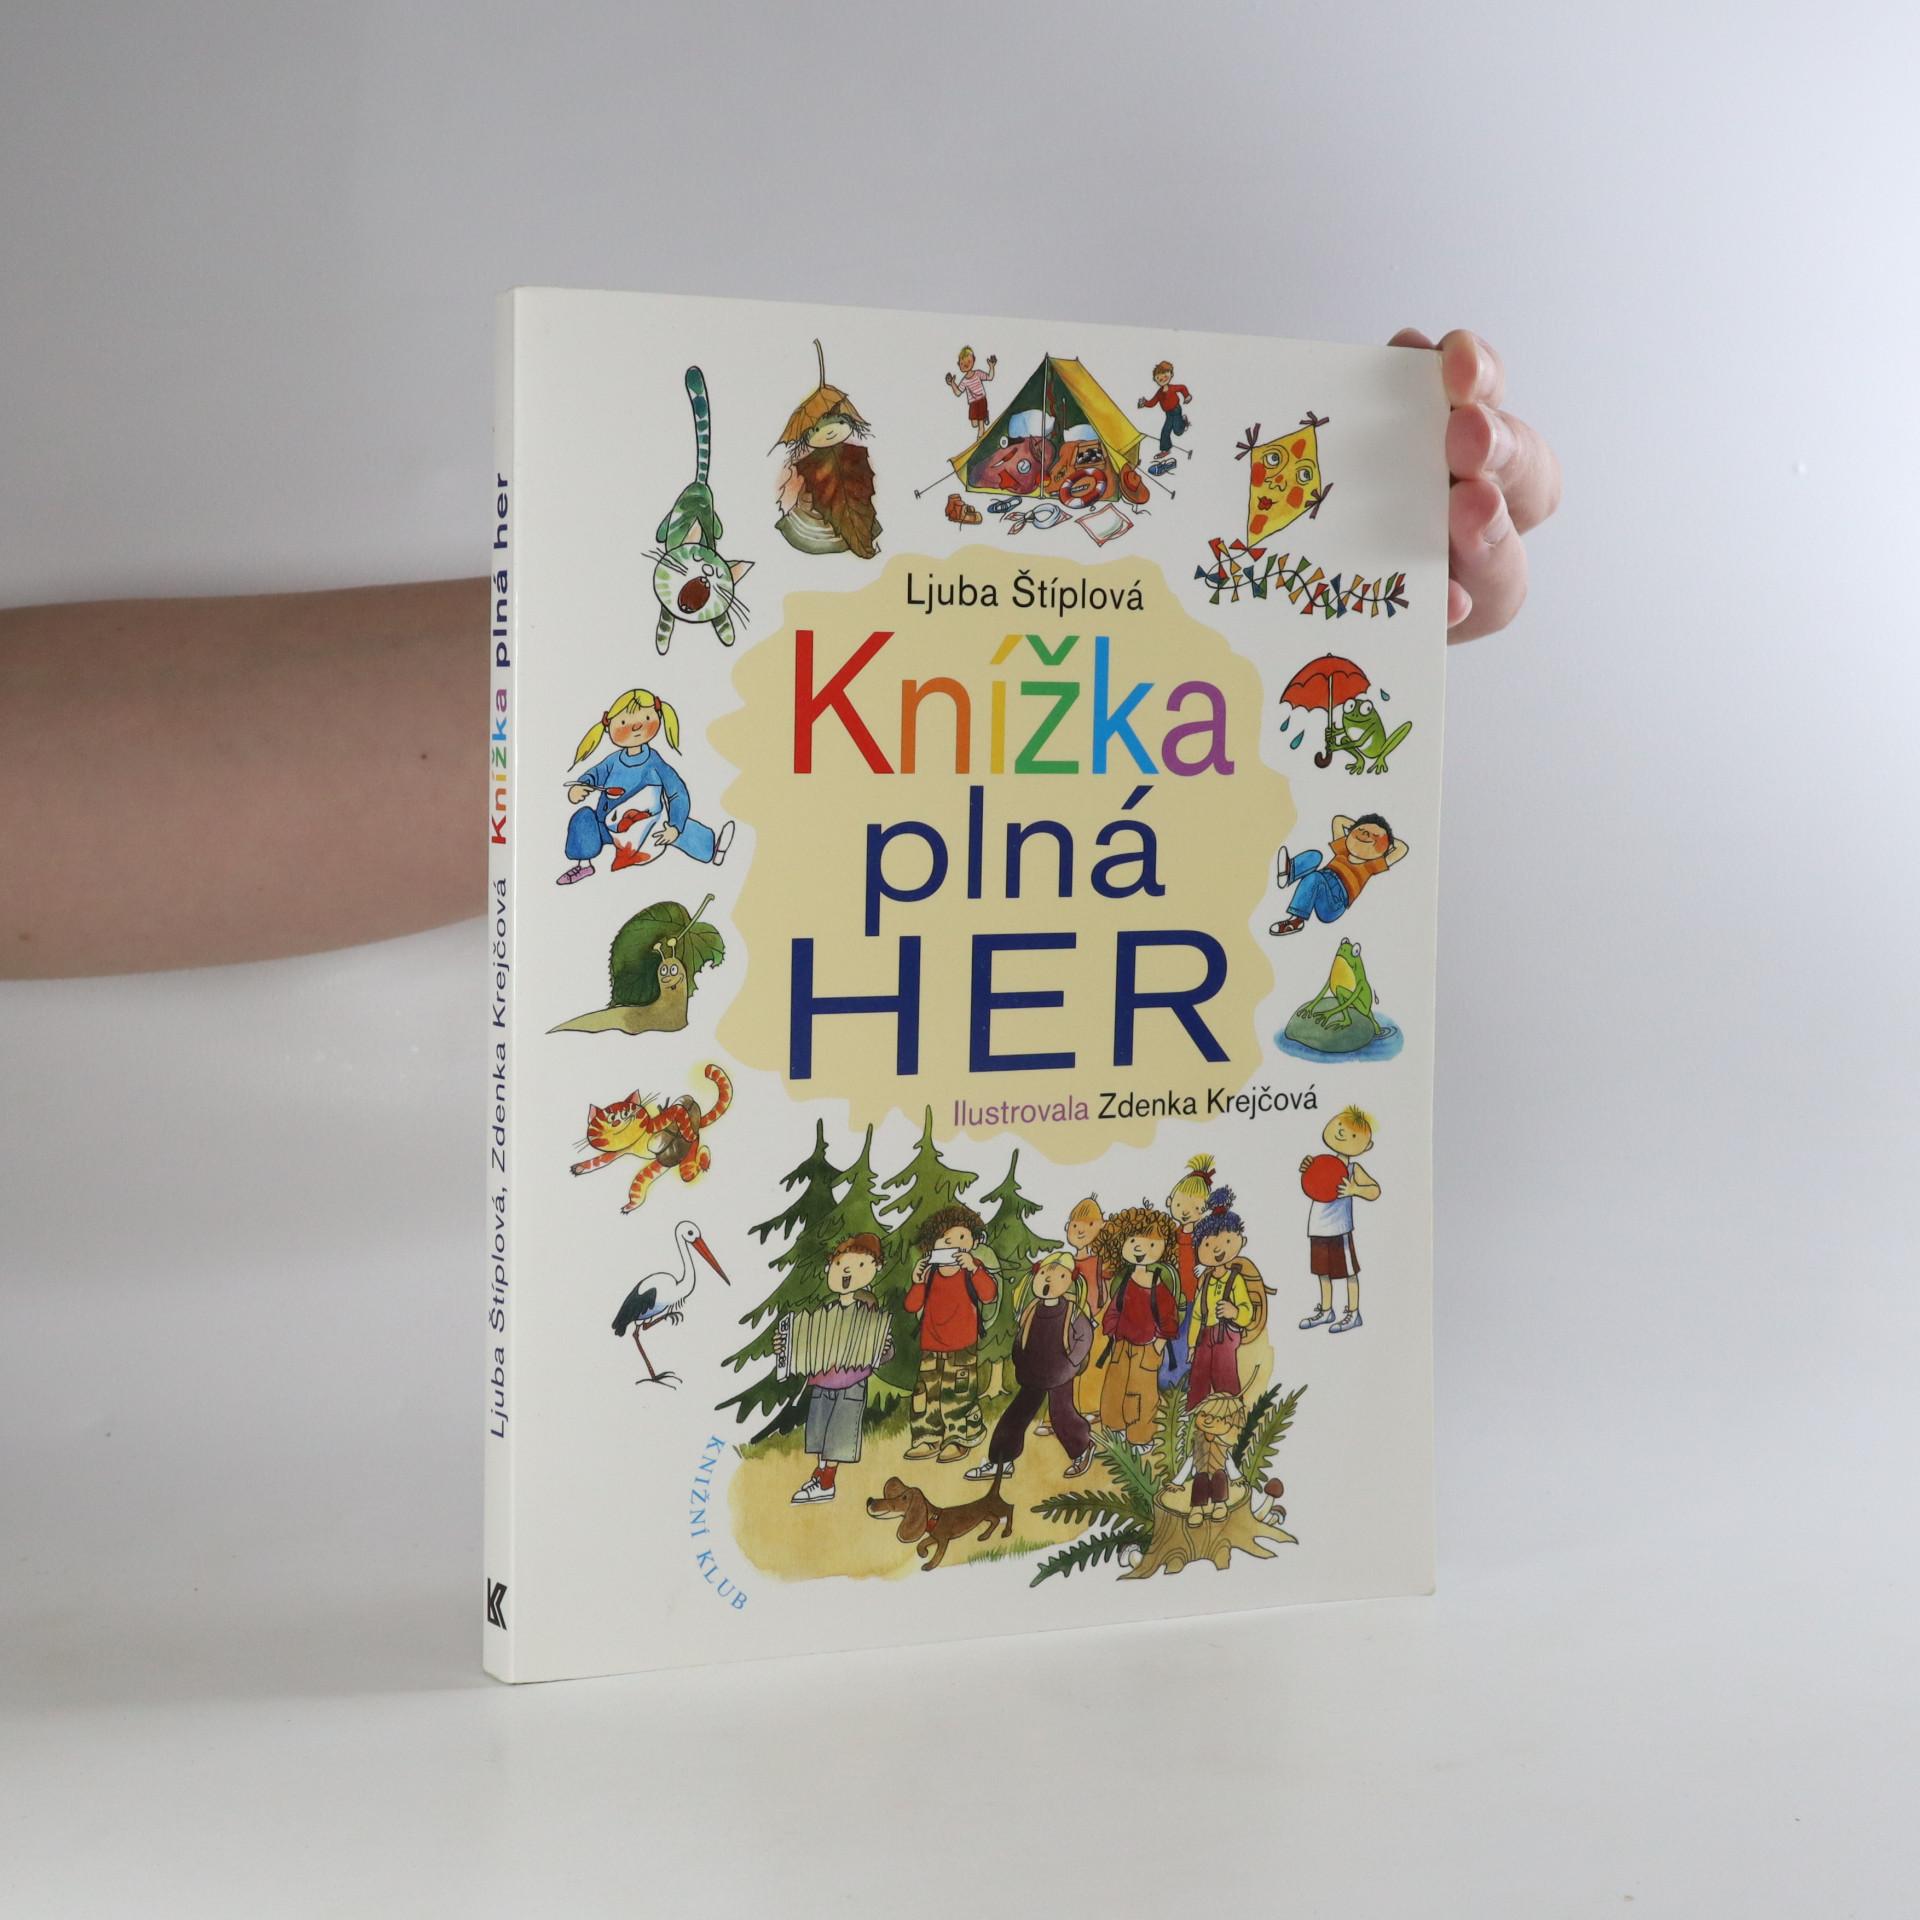 antikvární kniha Knížka plná her, 2009